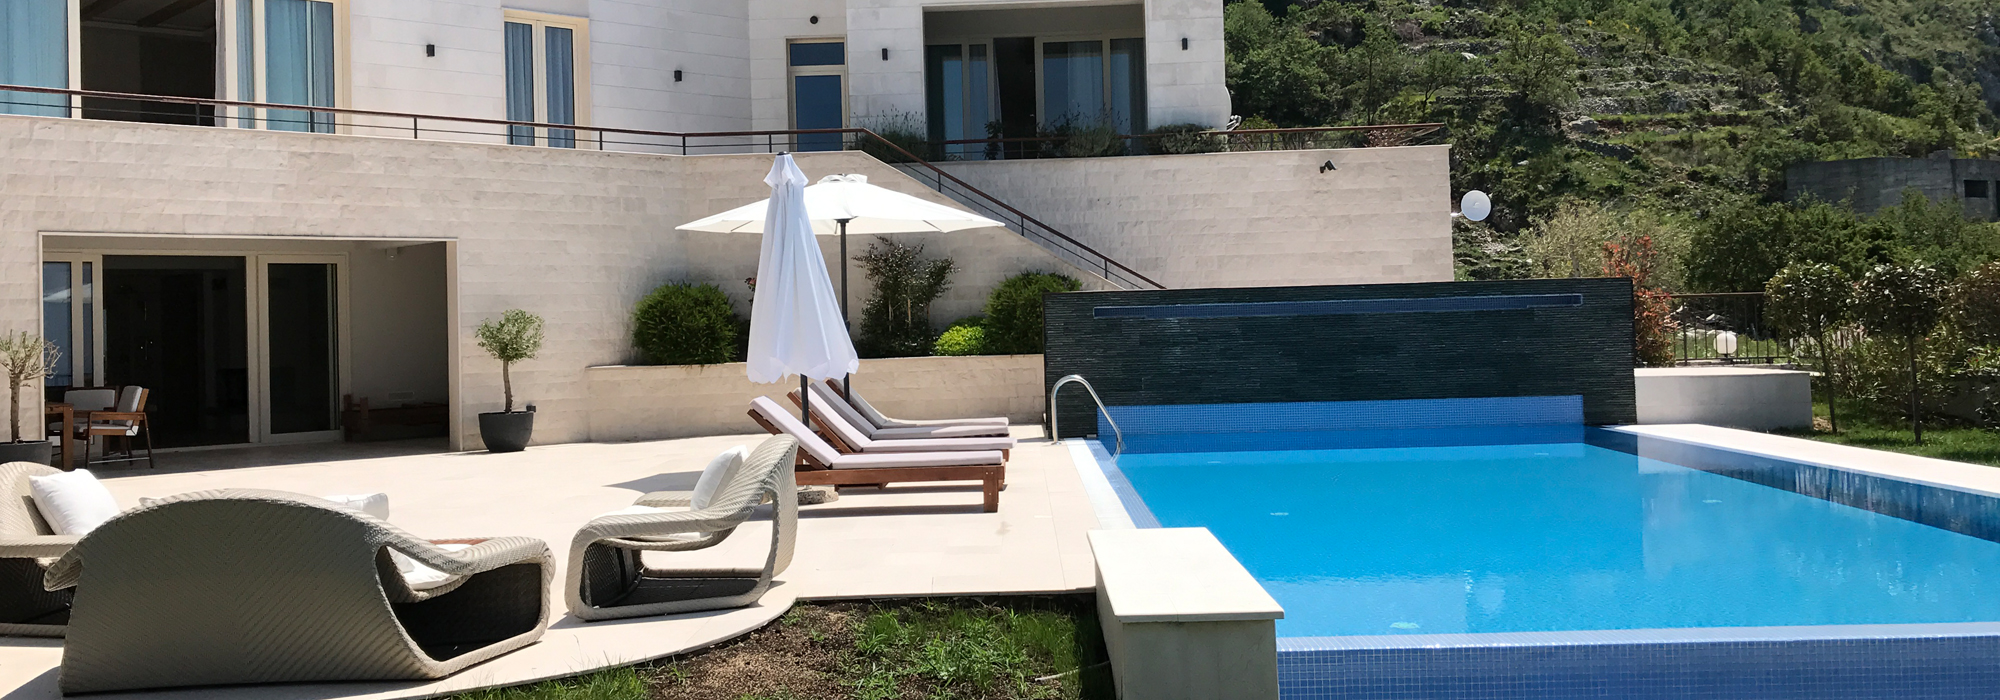 Exclusive new family villa Blizikuce, Budva